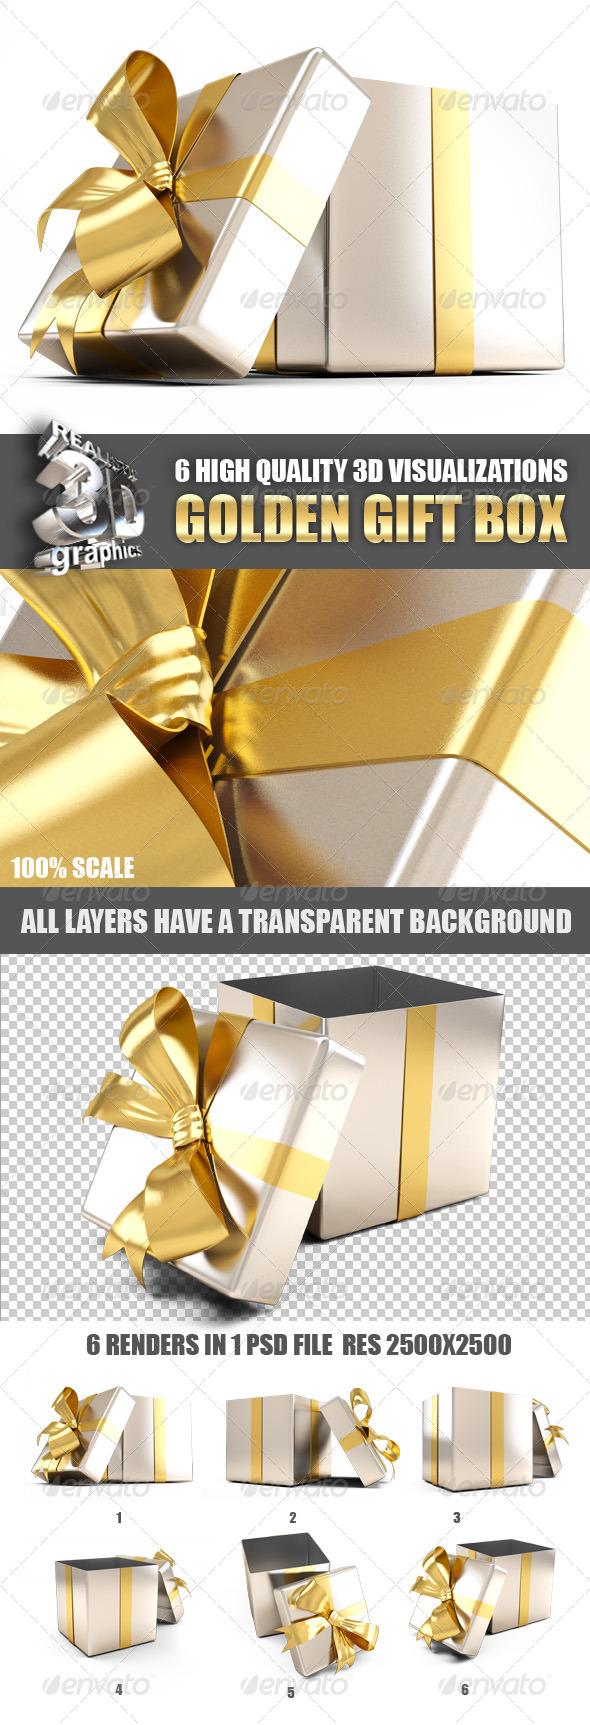 Golden Gift Box 设计素材下载